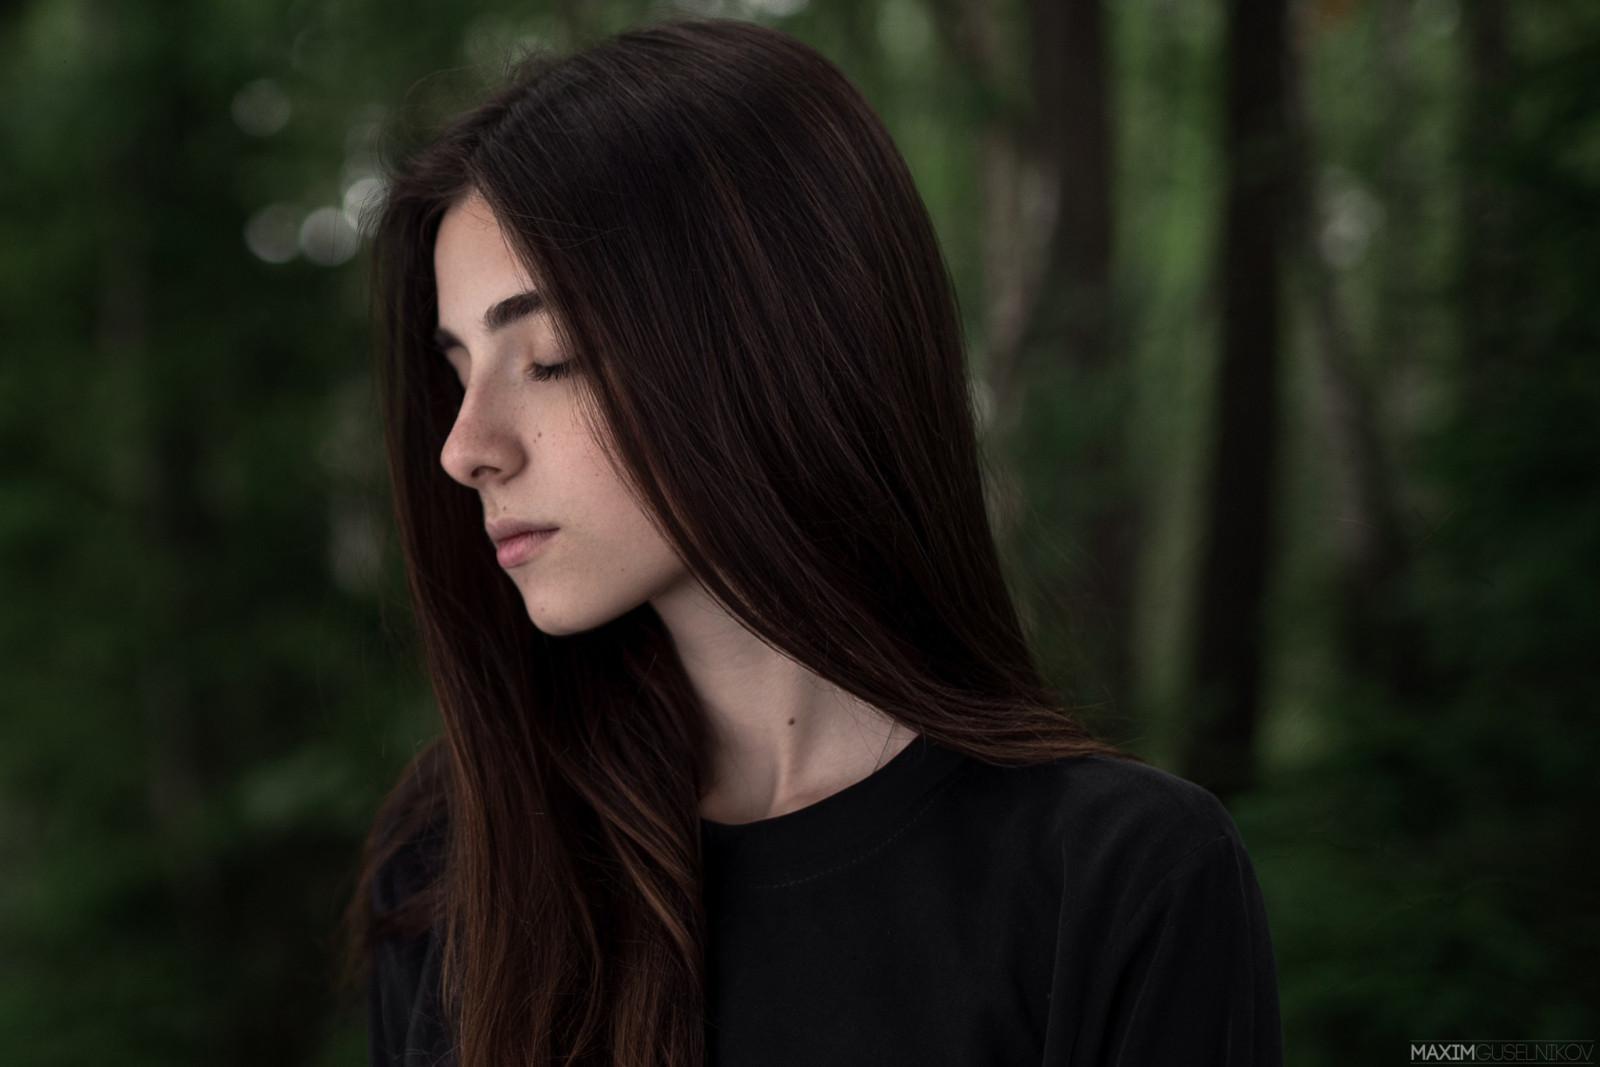 Wallpaper : face, sunlight, trees, women outdoors, model